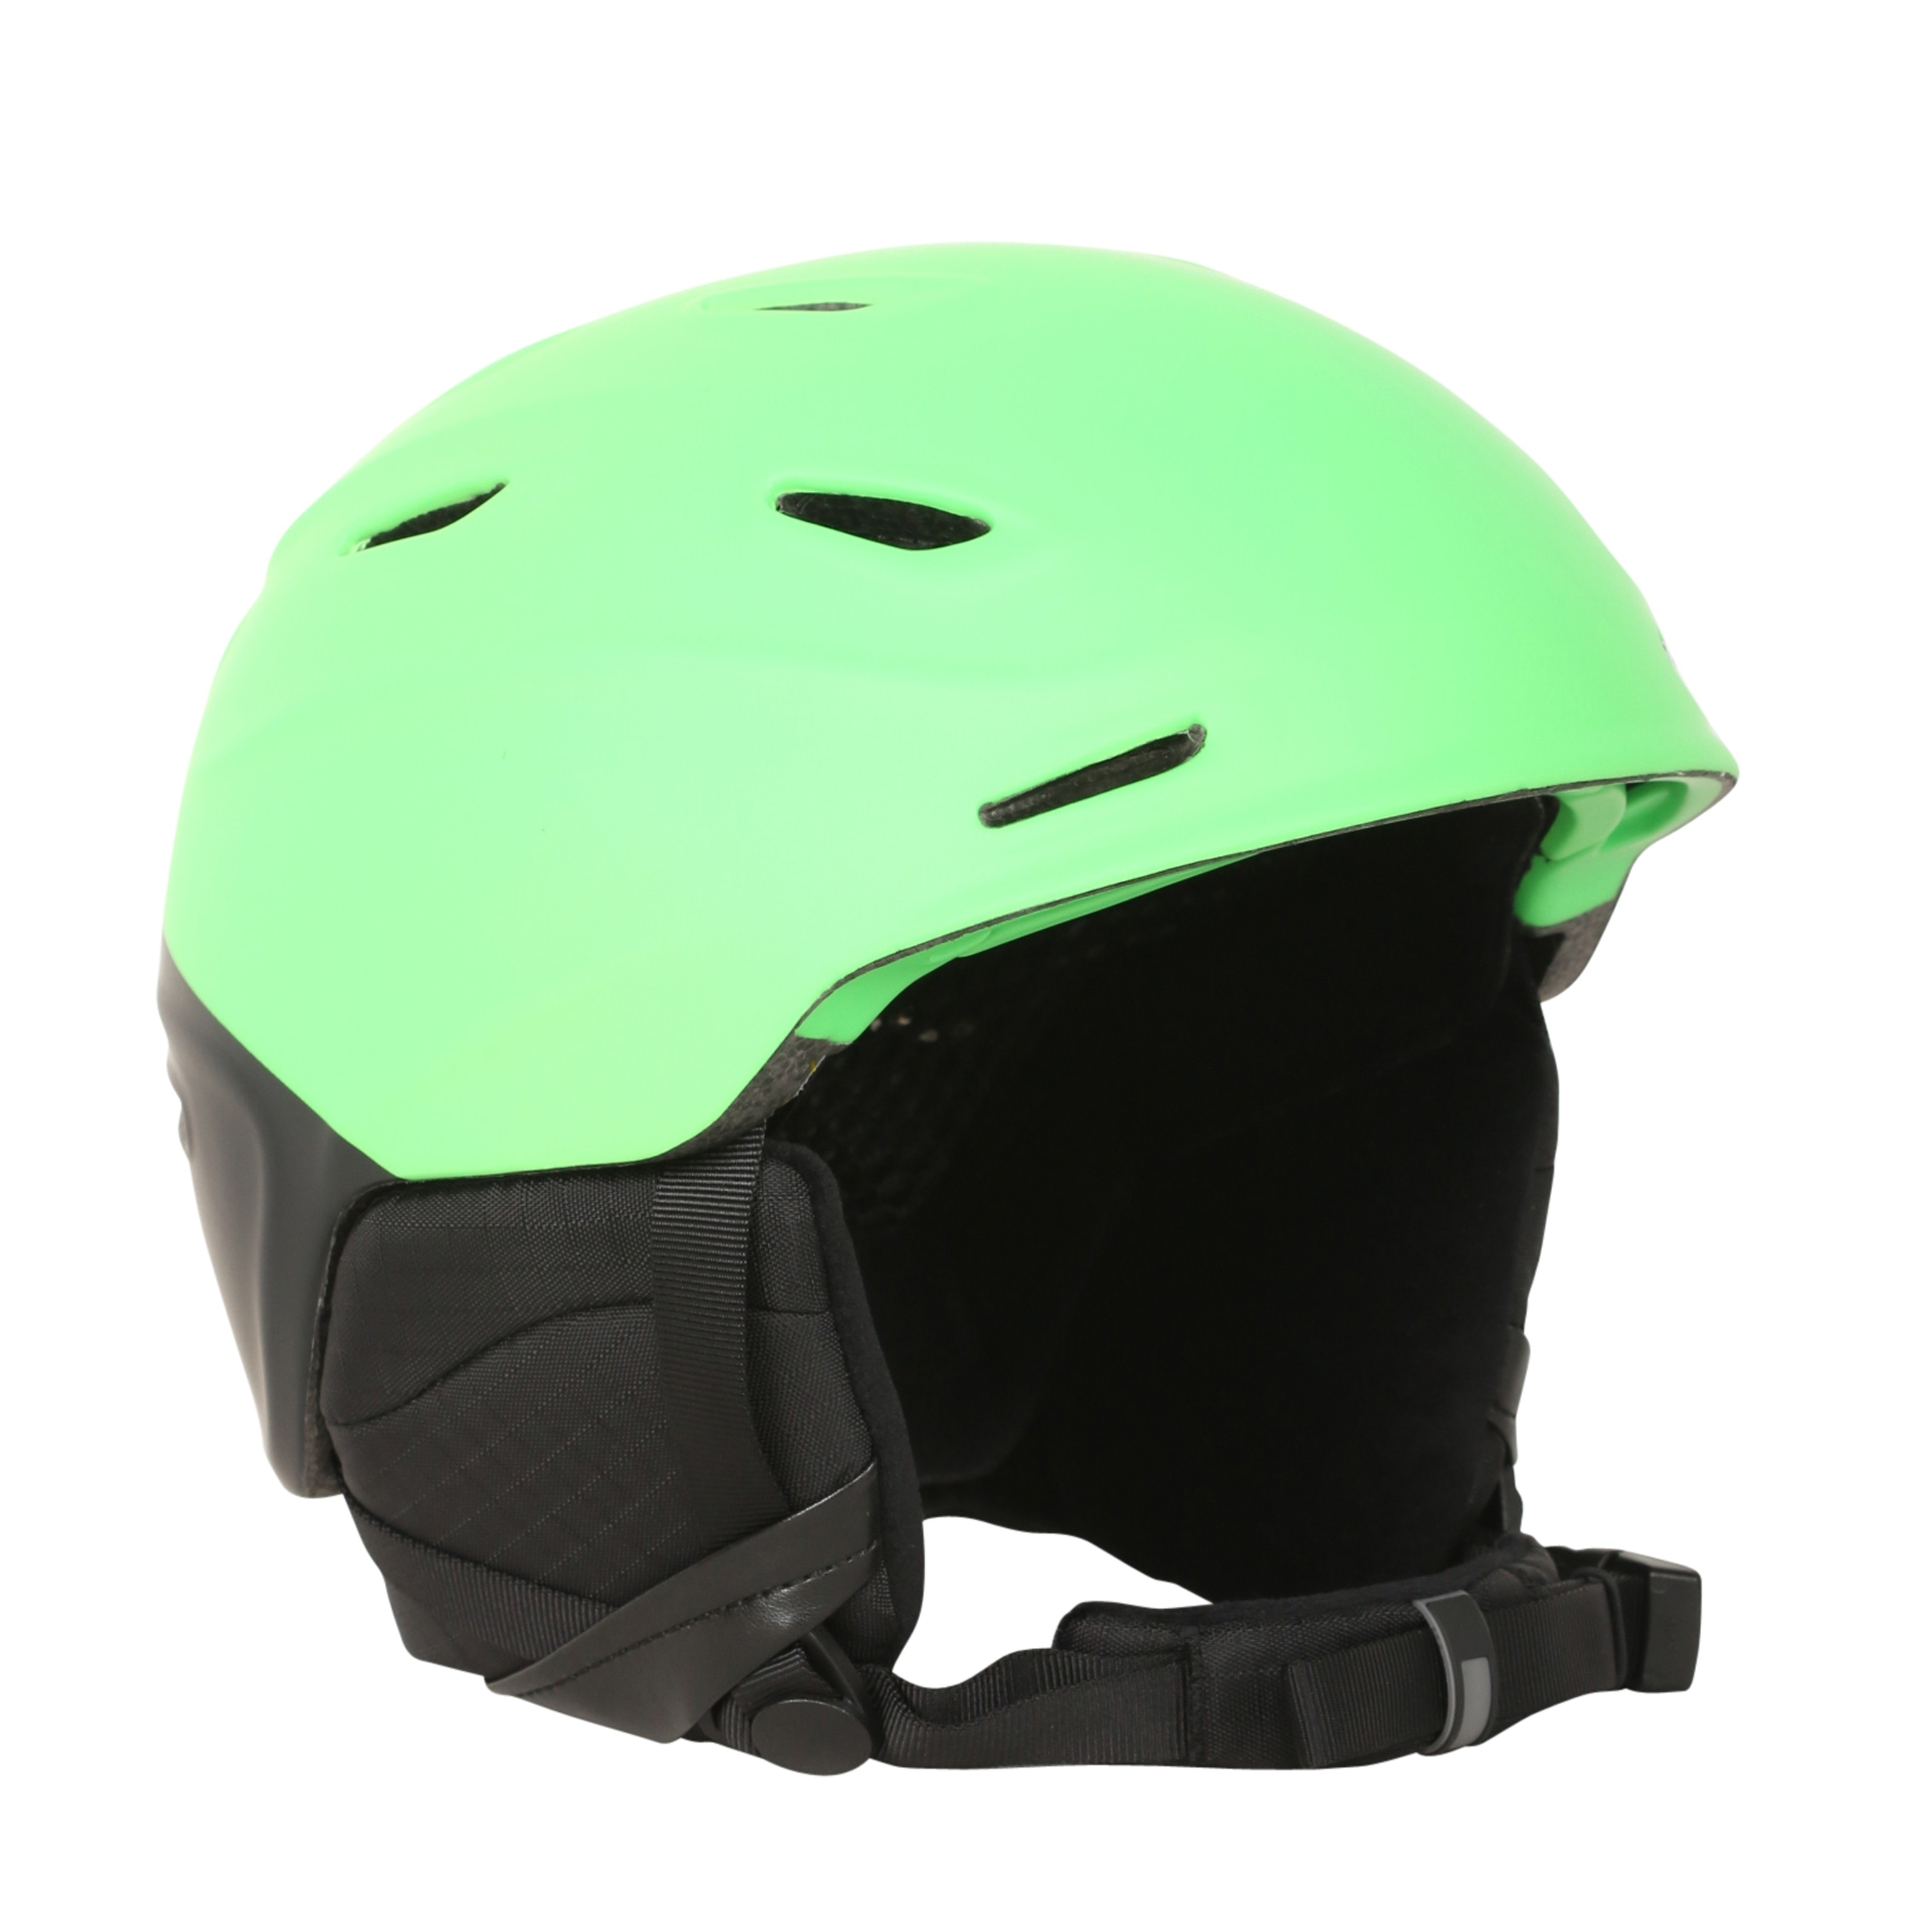 033e6af676 Smith Optics Aspect Matte Reactor Split MIPS Ski Snowboard Helmet - Green